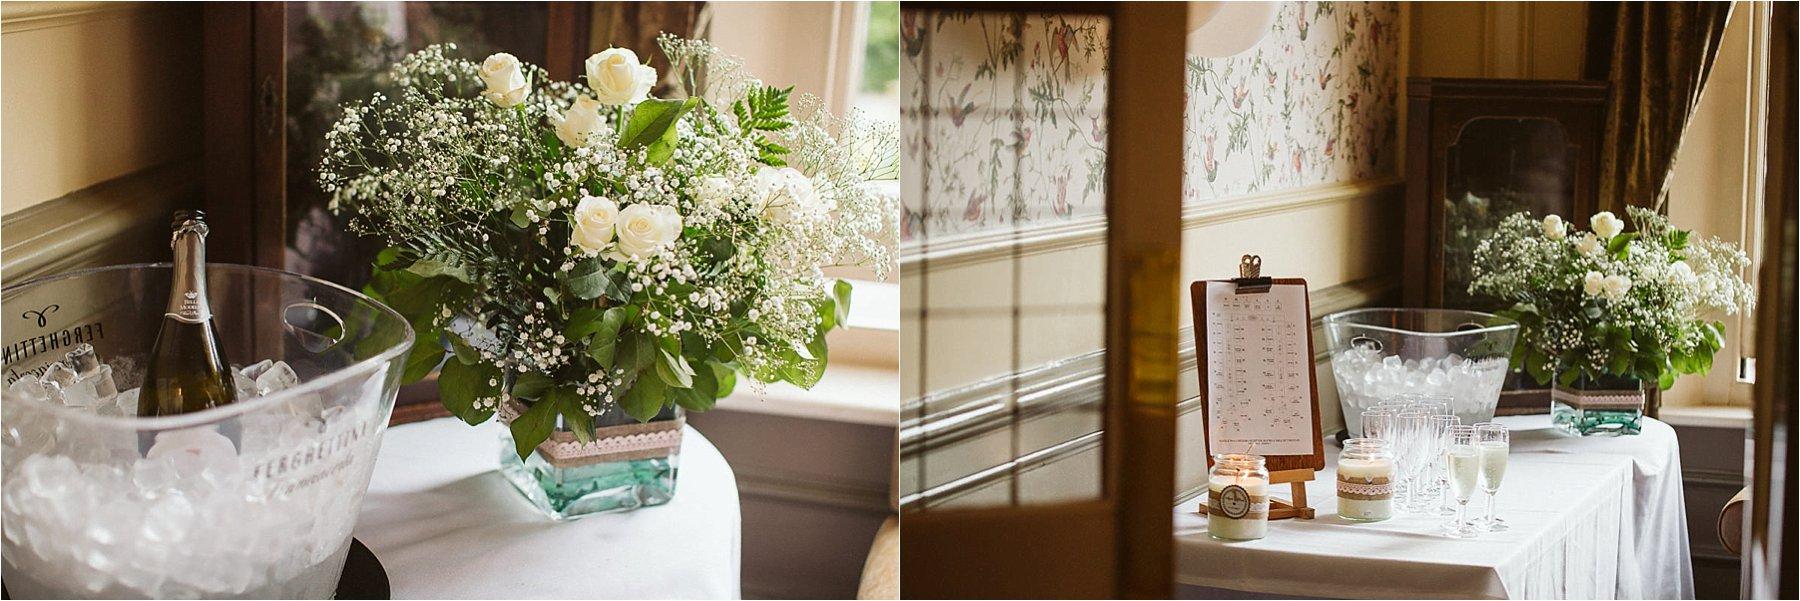 DIY wedding at the Warrington Hotel in Little Venice London